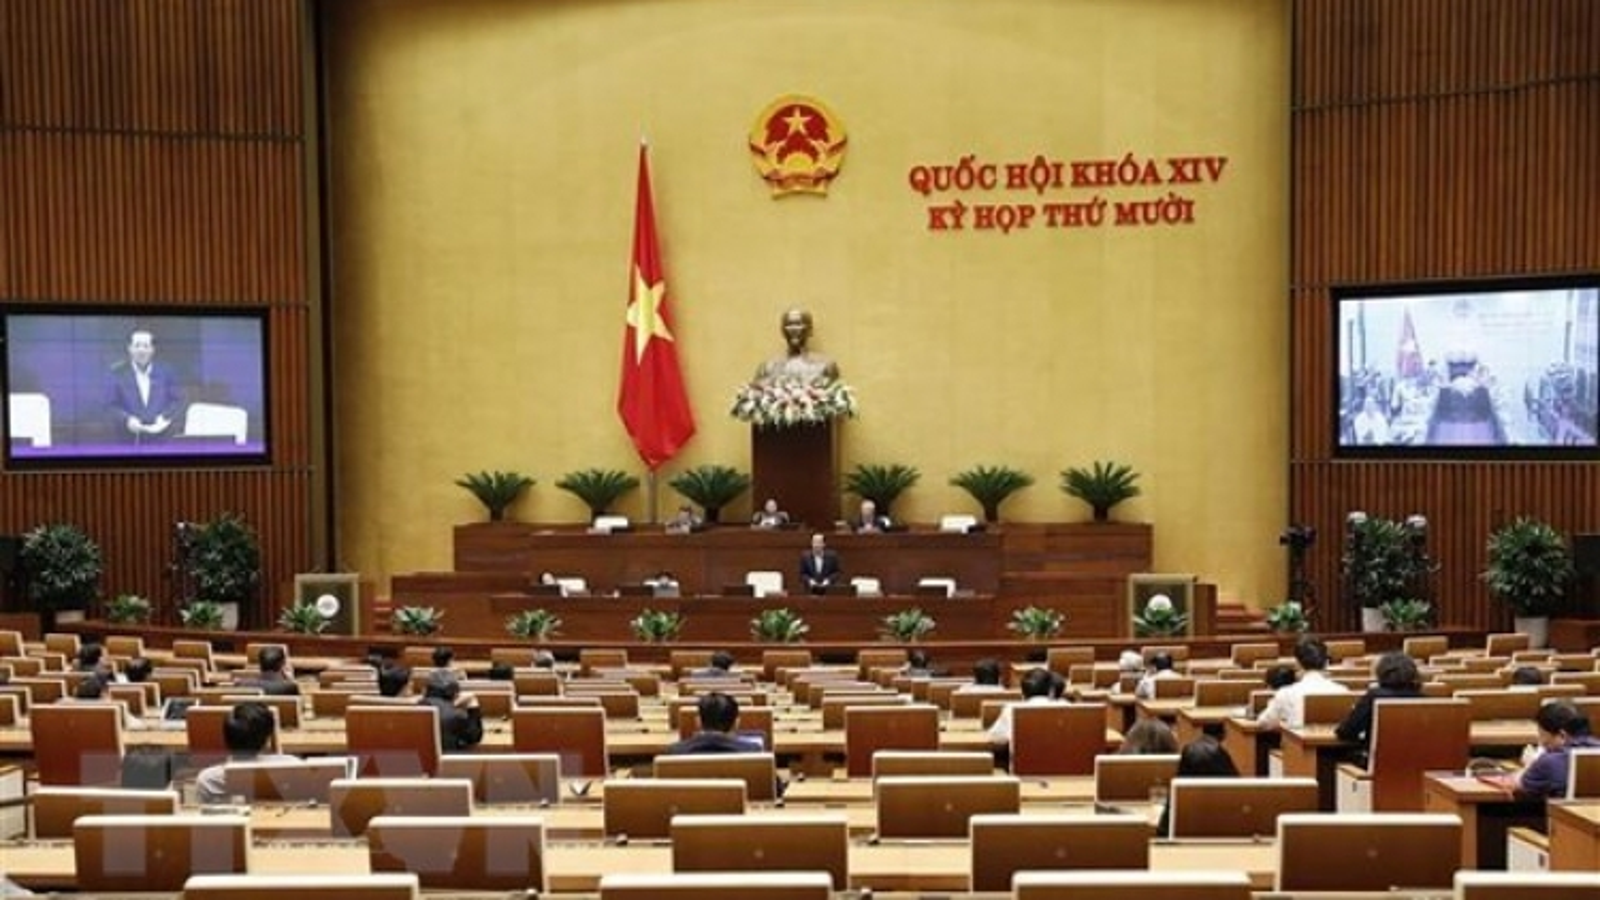 Legislators to discuss socio-economic development issues